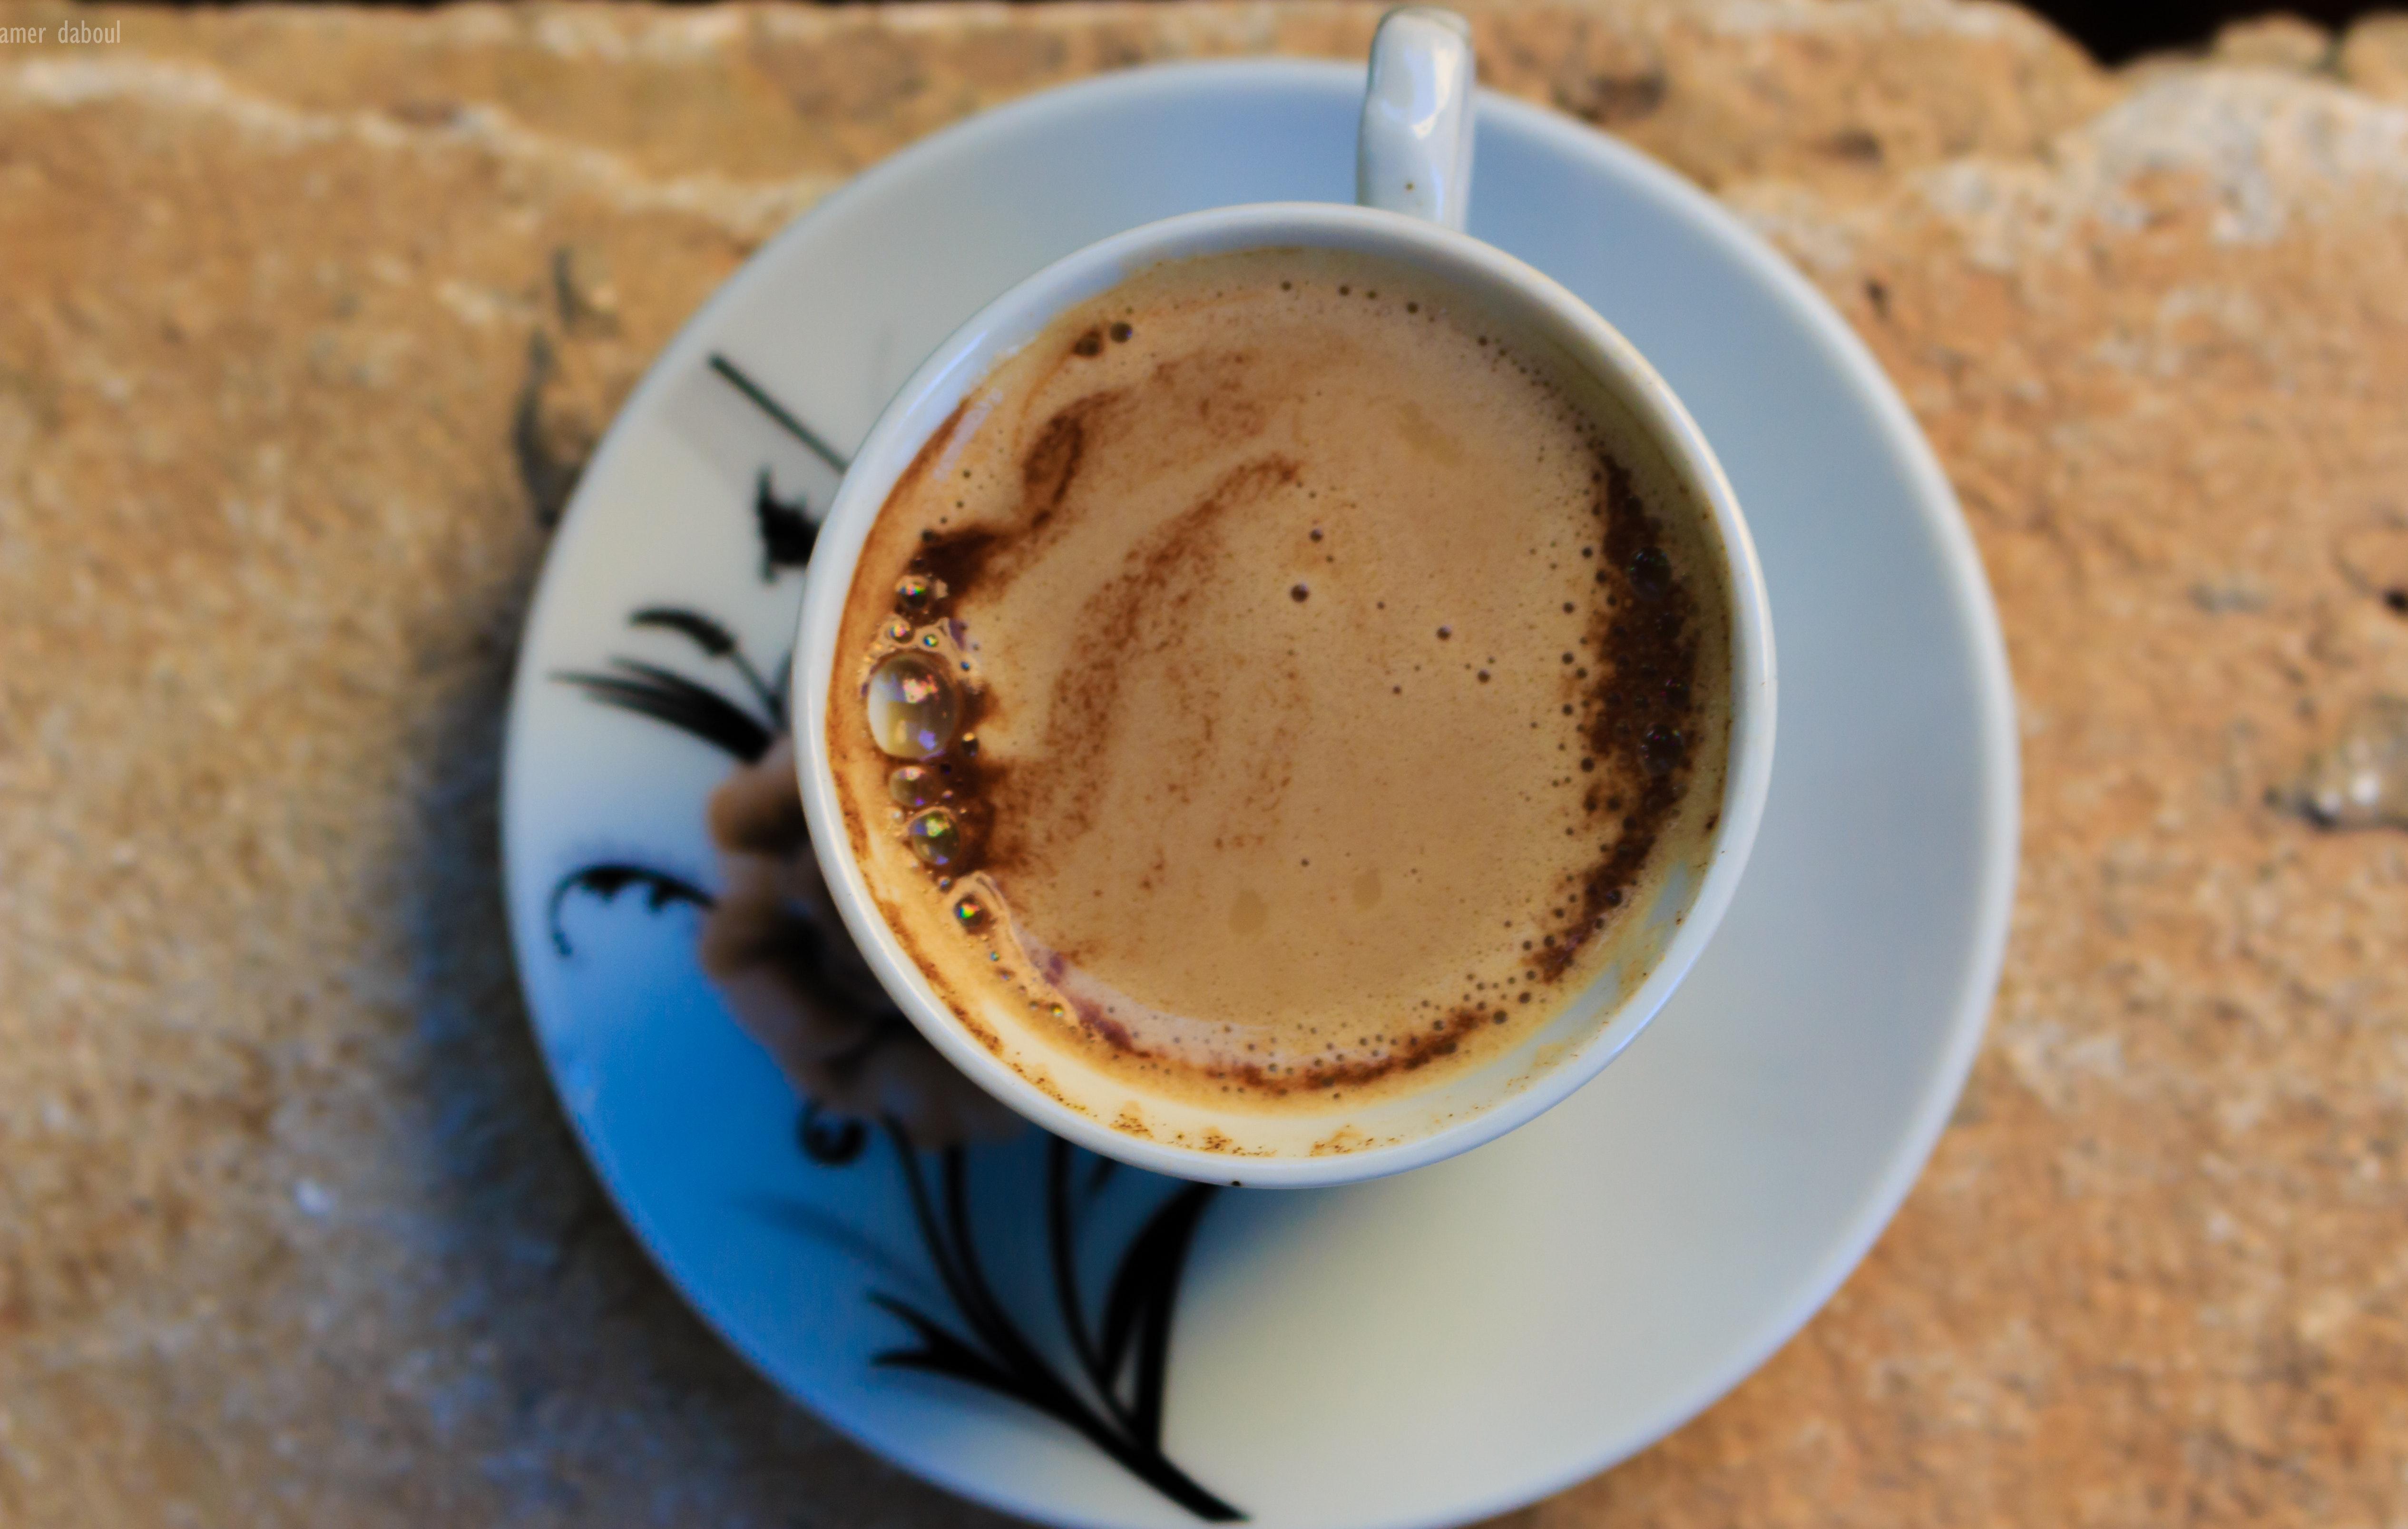 White ceramic mug with coffee and white ceramic saucer photo